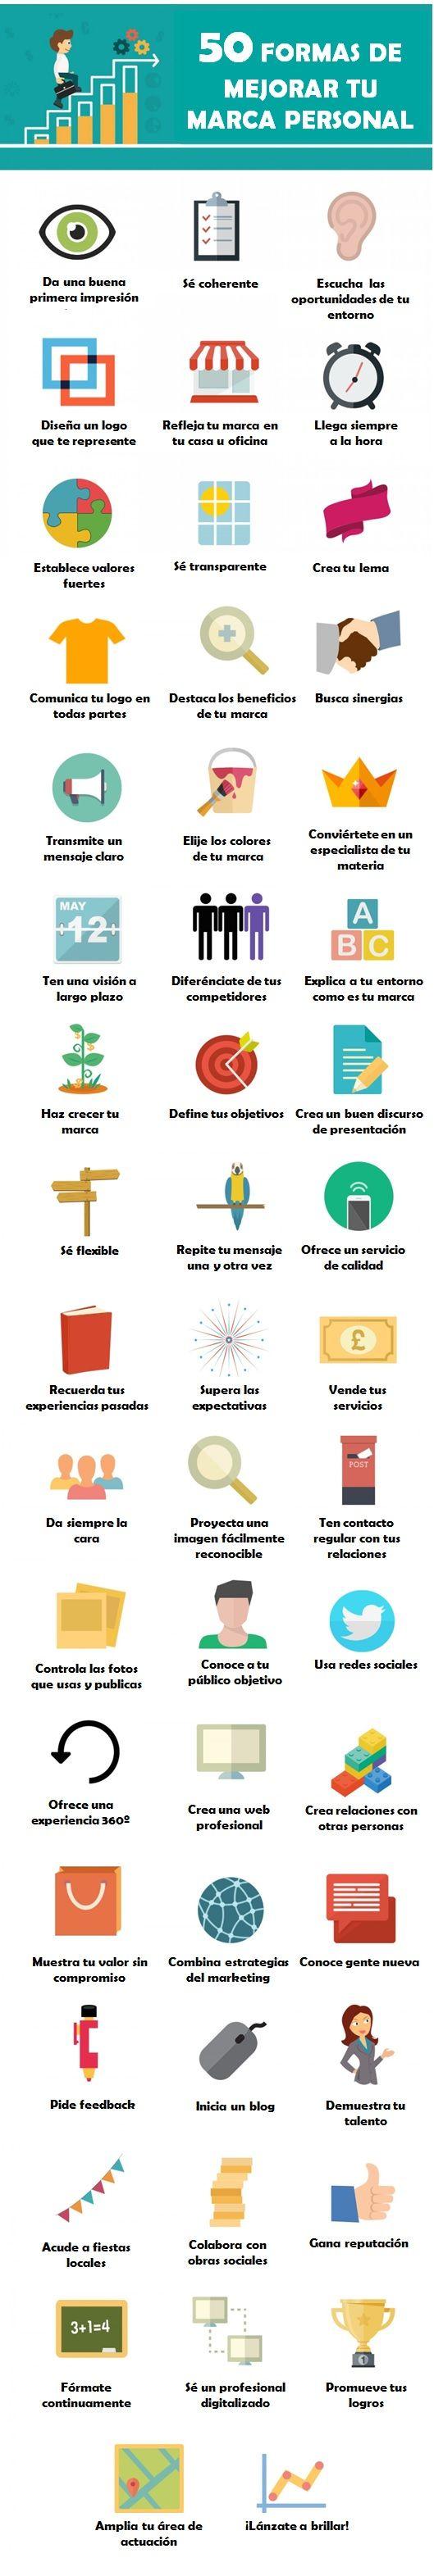 50 formas de mejorar tu Marca Personal. #infografia